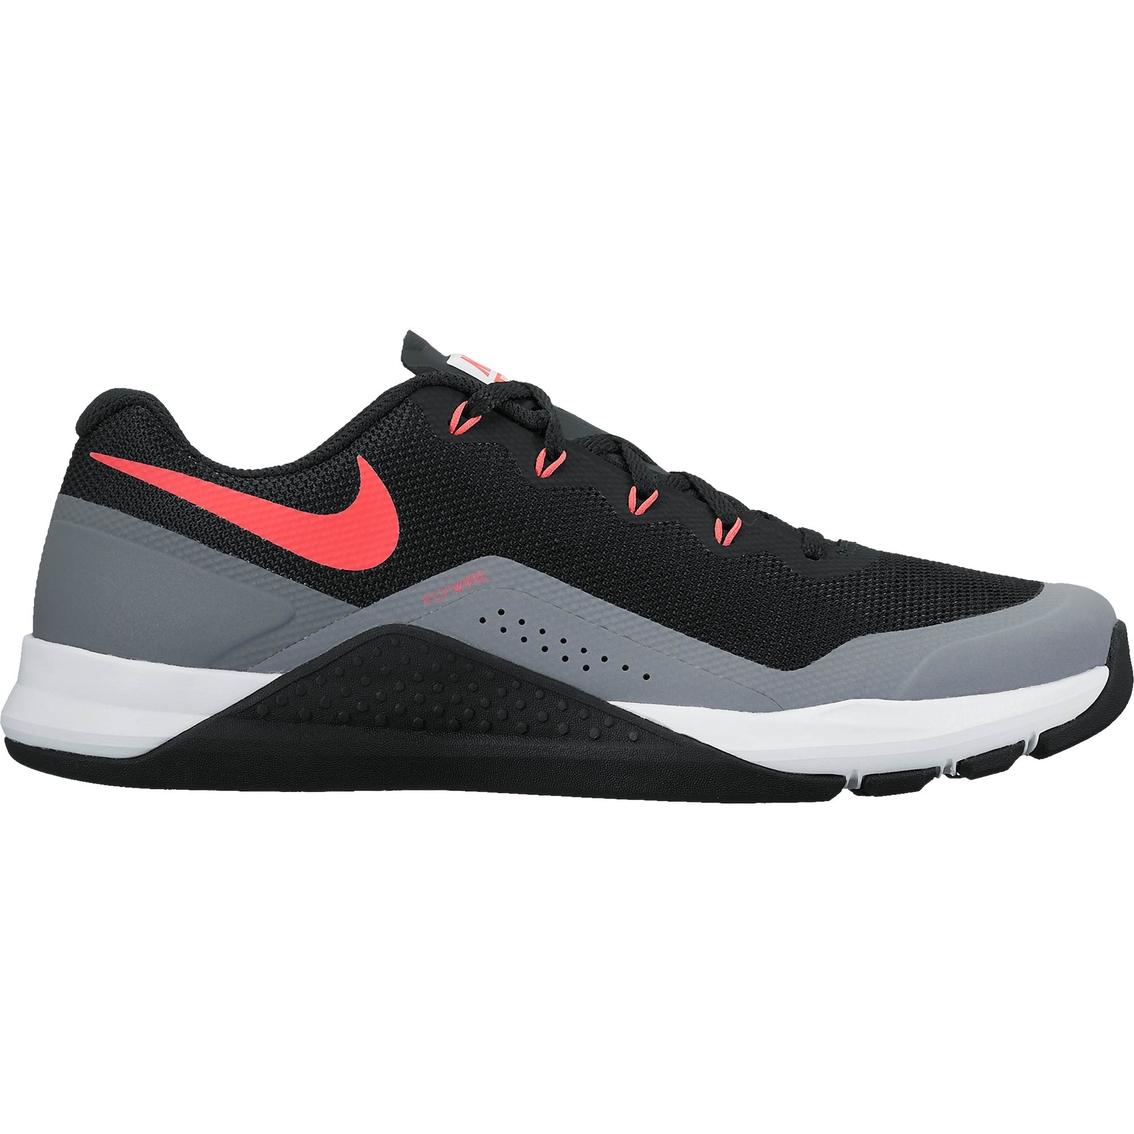 82db7f420d2688 Nike Women s Metcon Repper Dsx Training Shoes